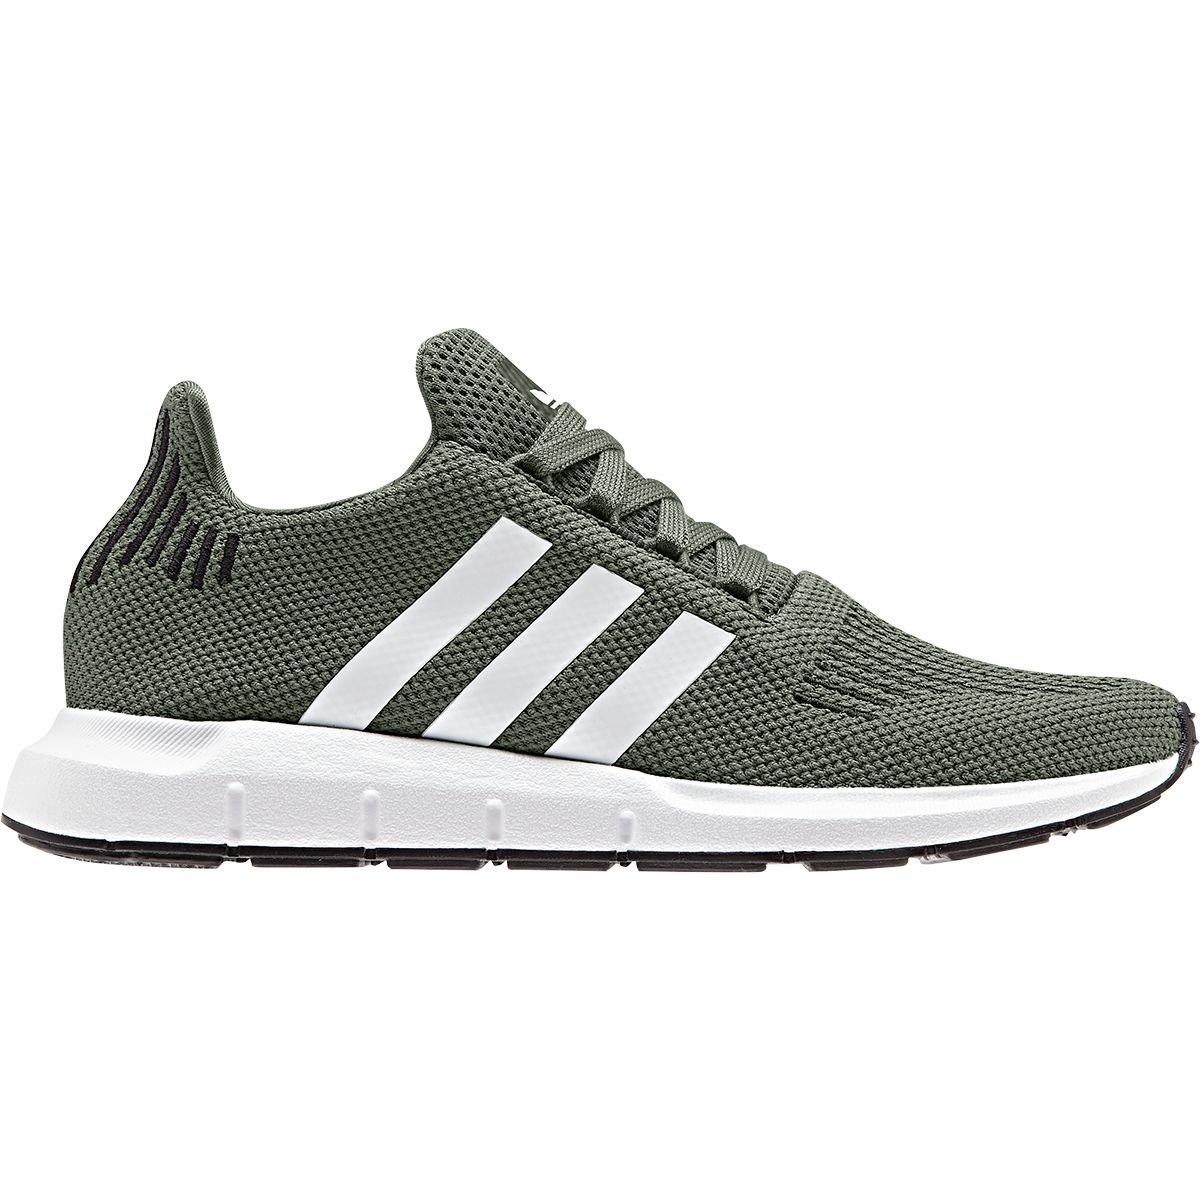 adidas Originals Women's Swift Running Shoe, Base Green/White/Black, 9 M US